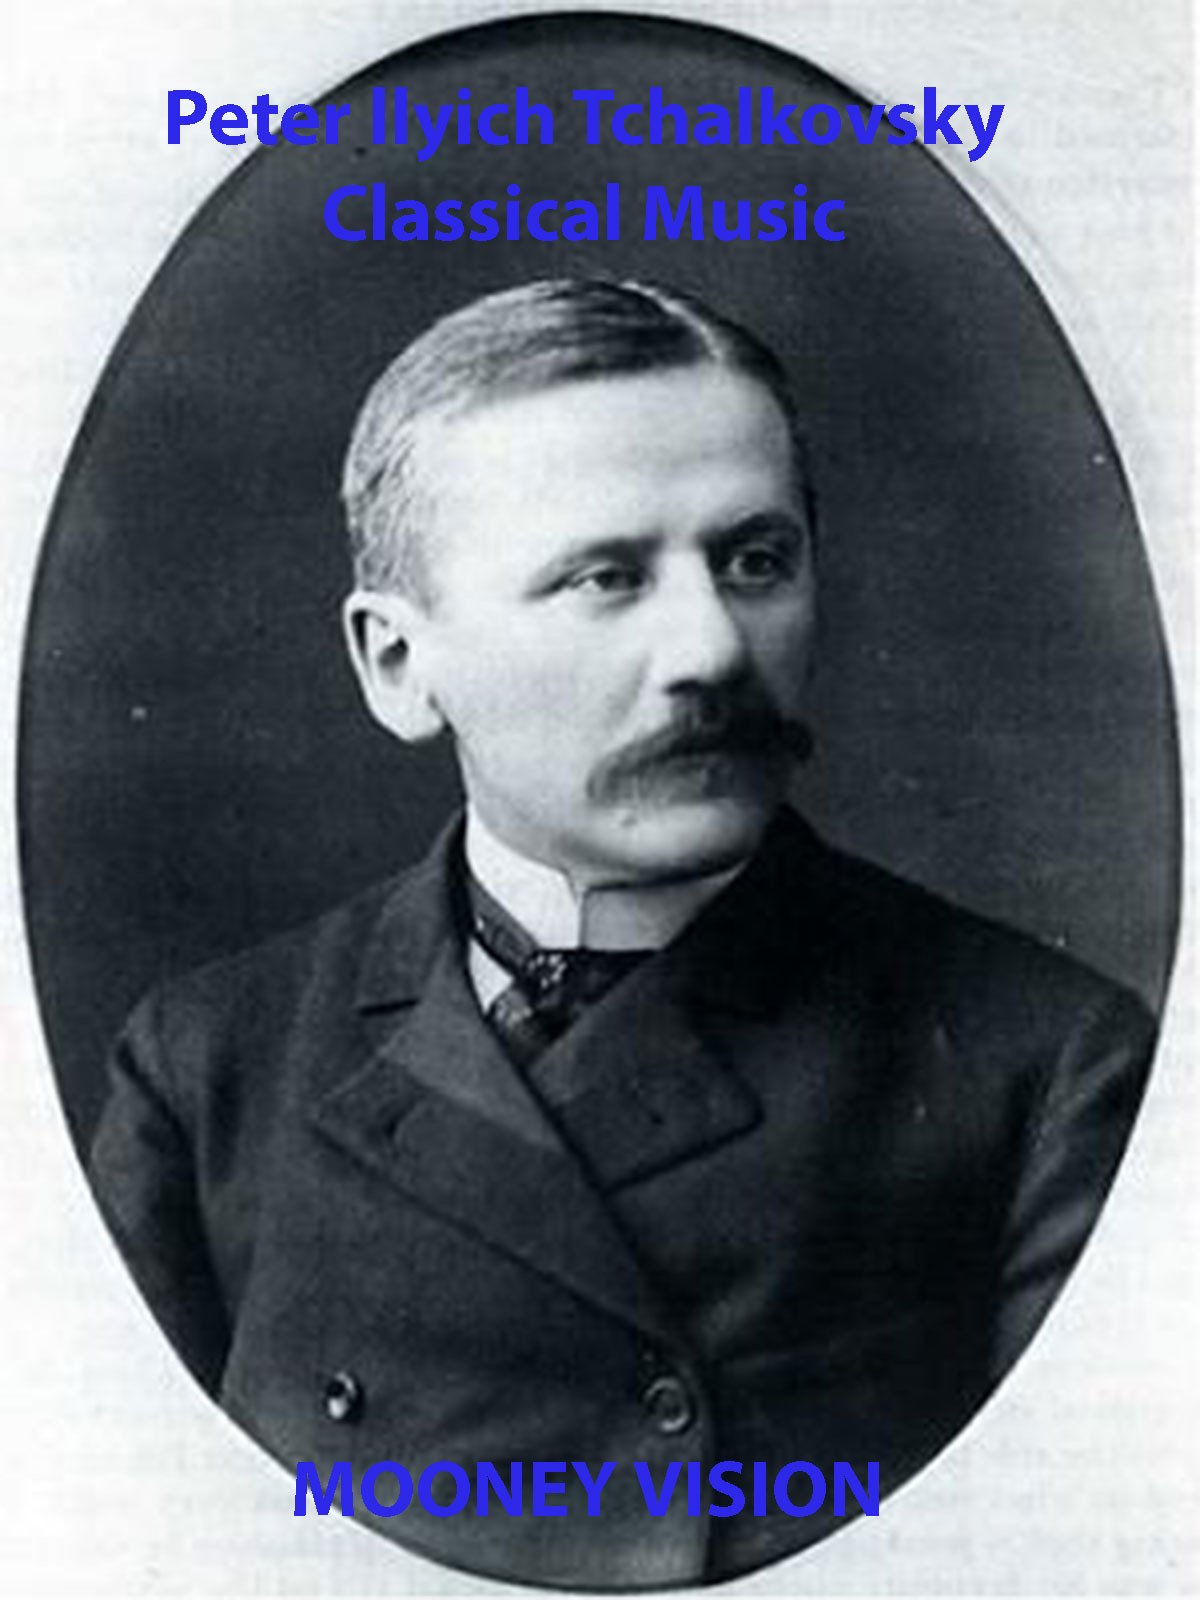 Peter Ilyich Tchaikovsky Classical Music